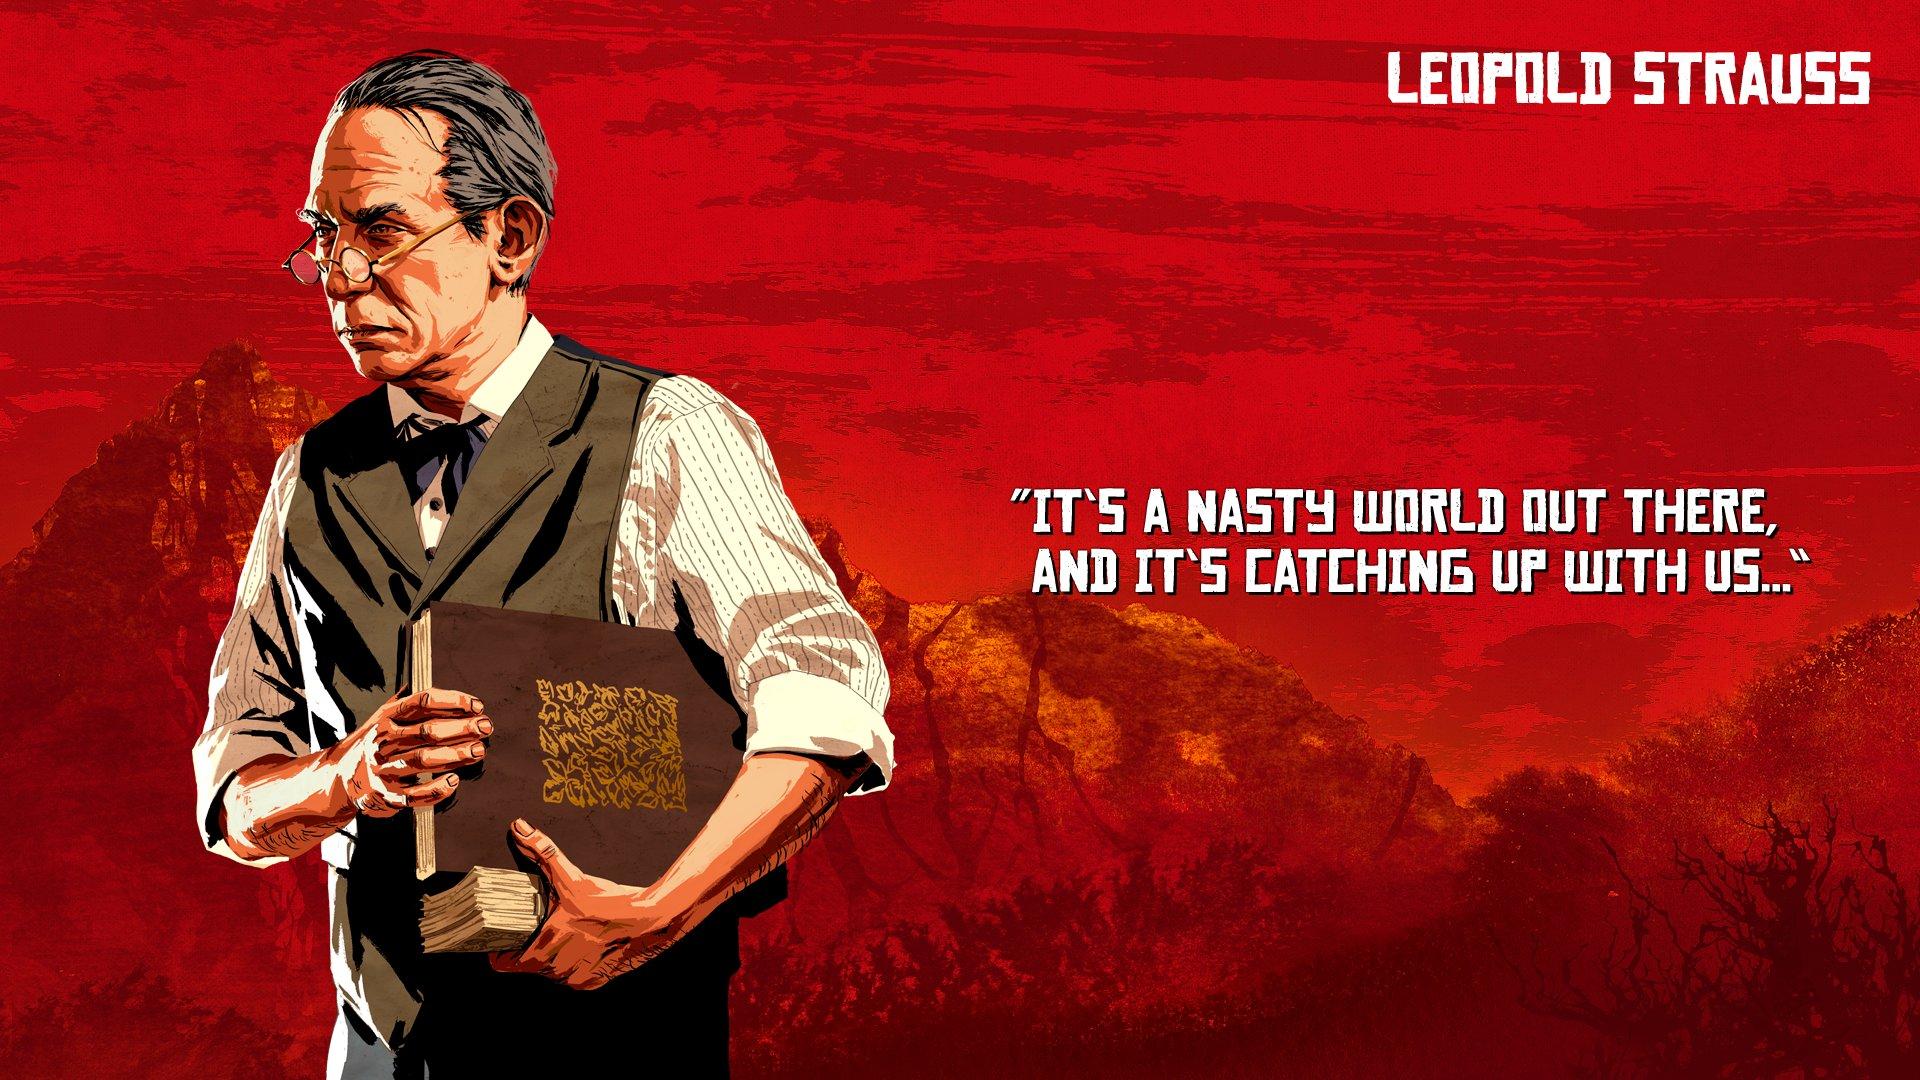 Rockstar Games revela artes dos personagens de Red Dead Redemption 2; veja 10